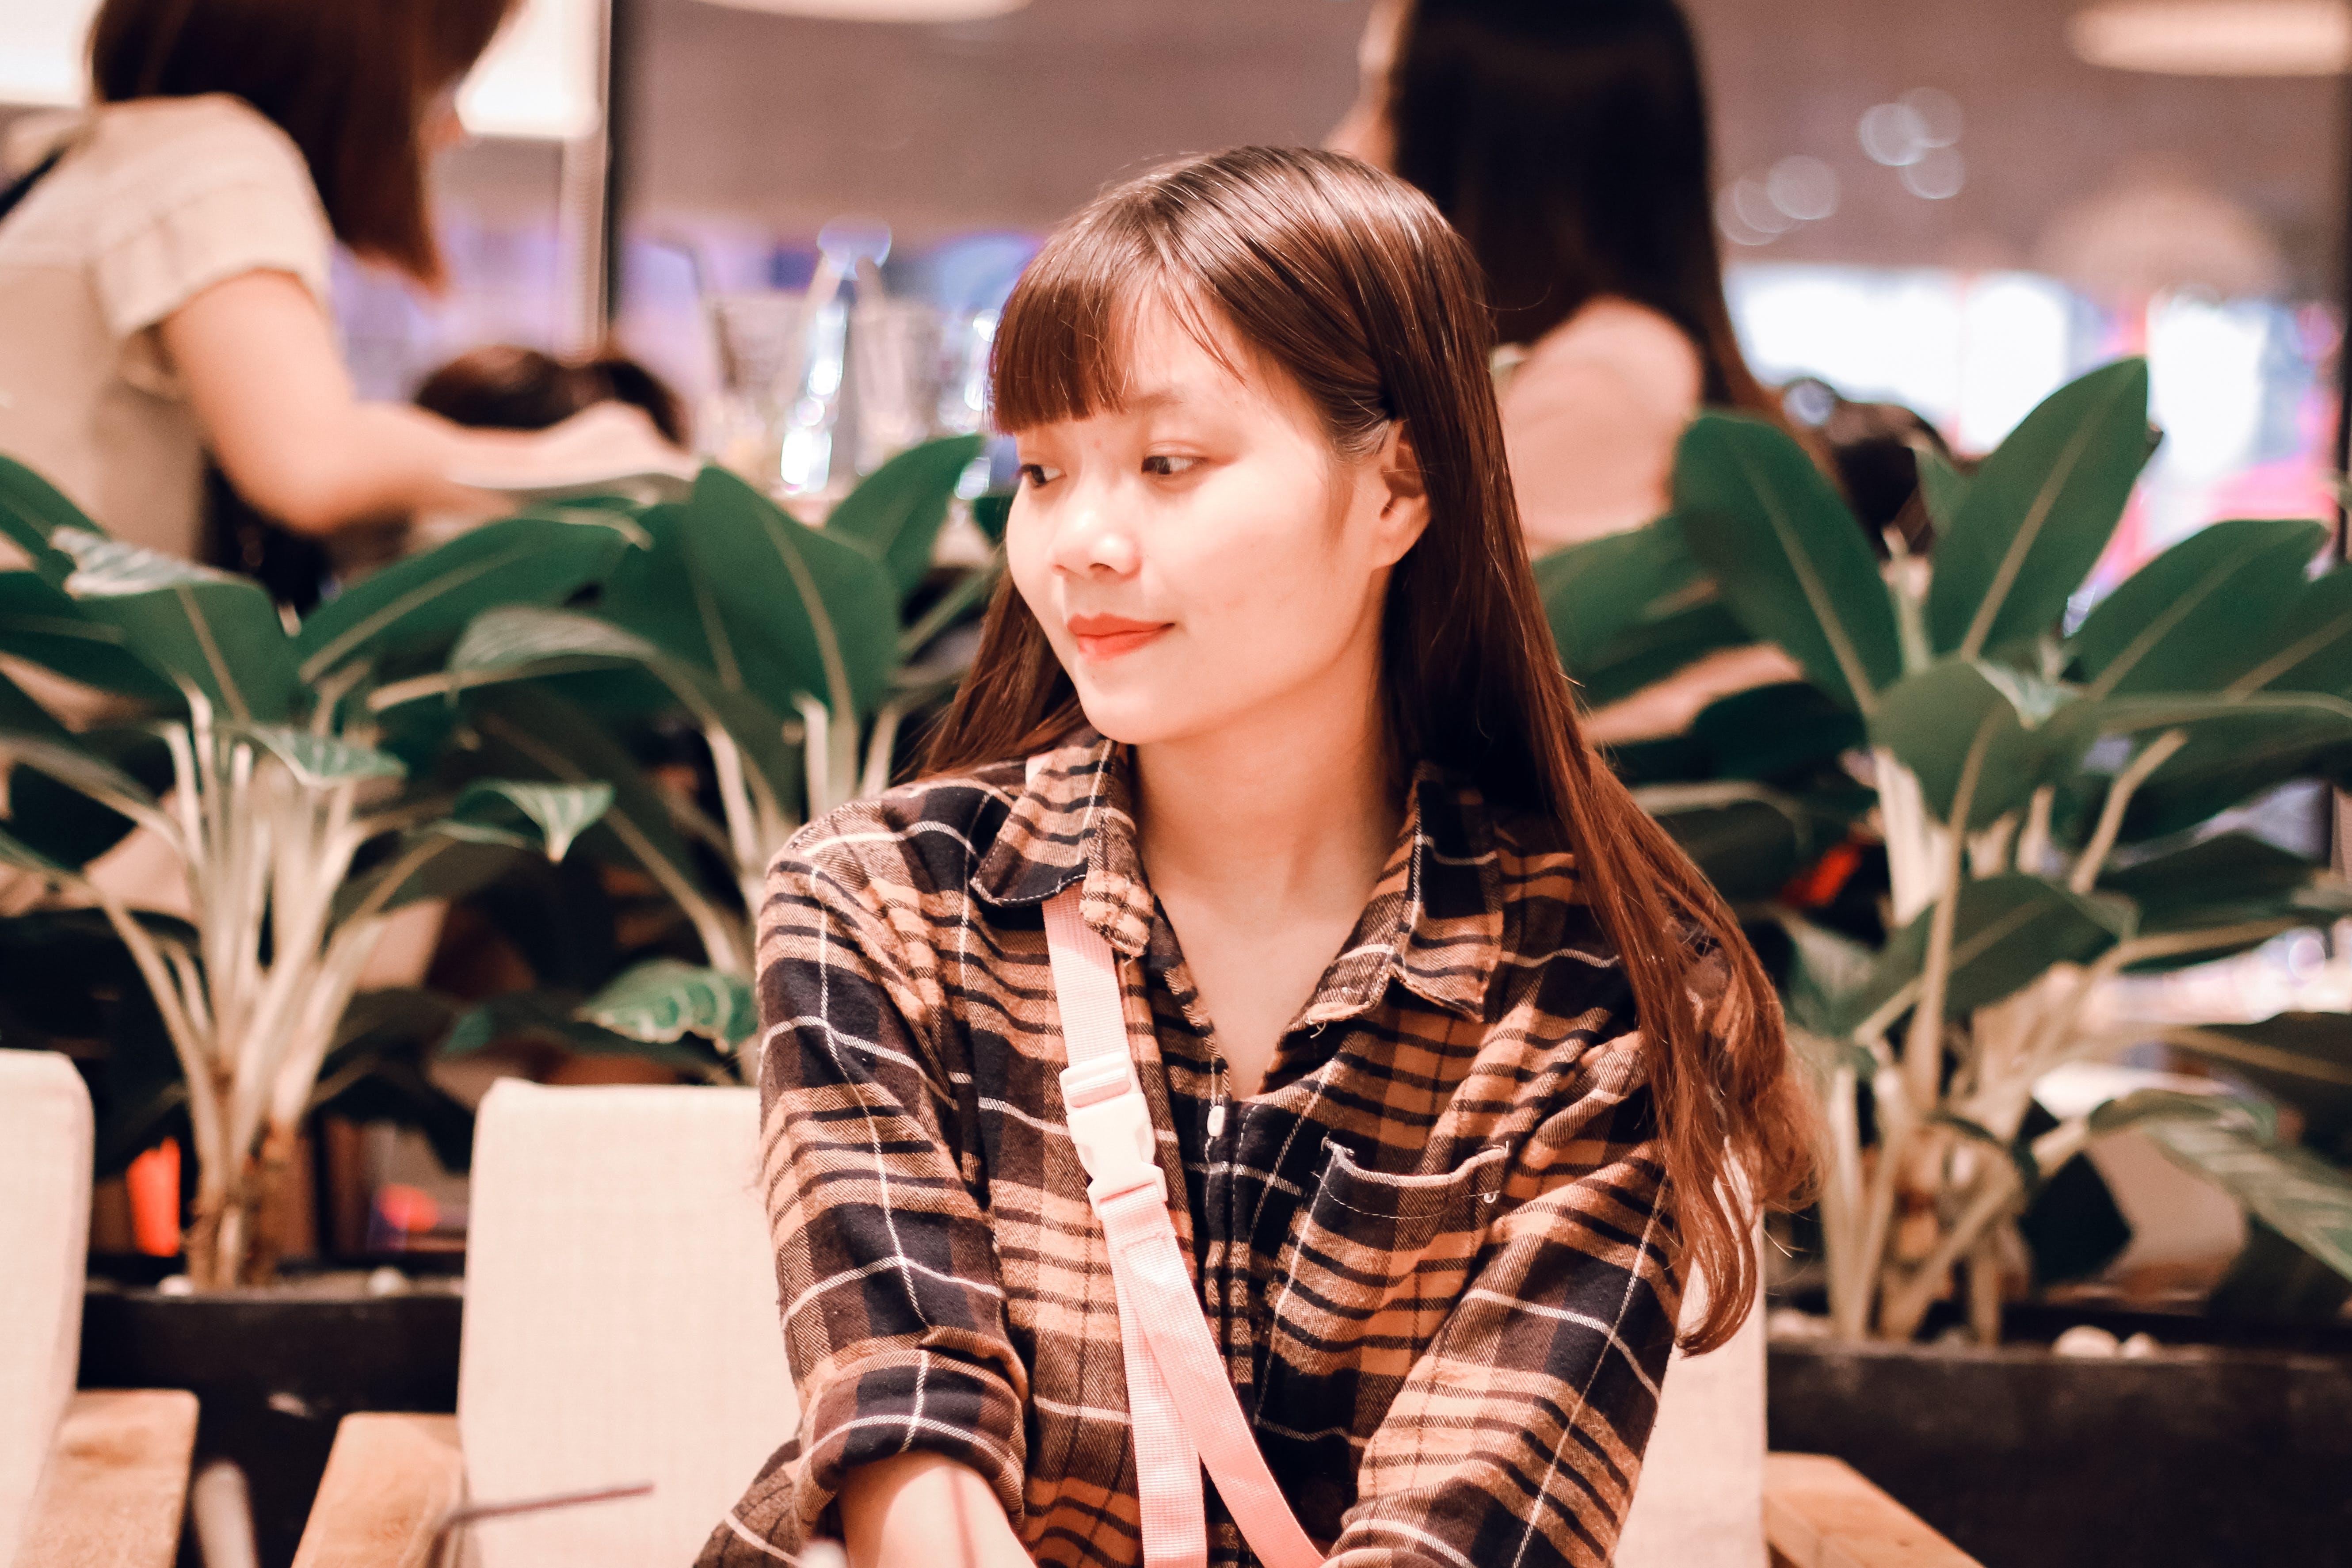 Woman Wearing Black and Brown Plaid Sport Shirt Sitting on Sofa